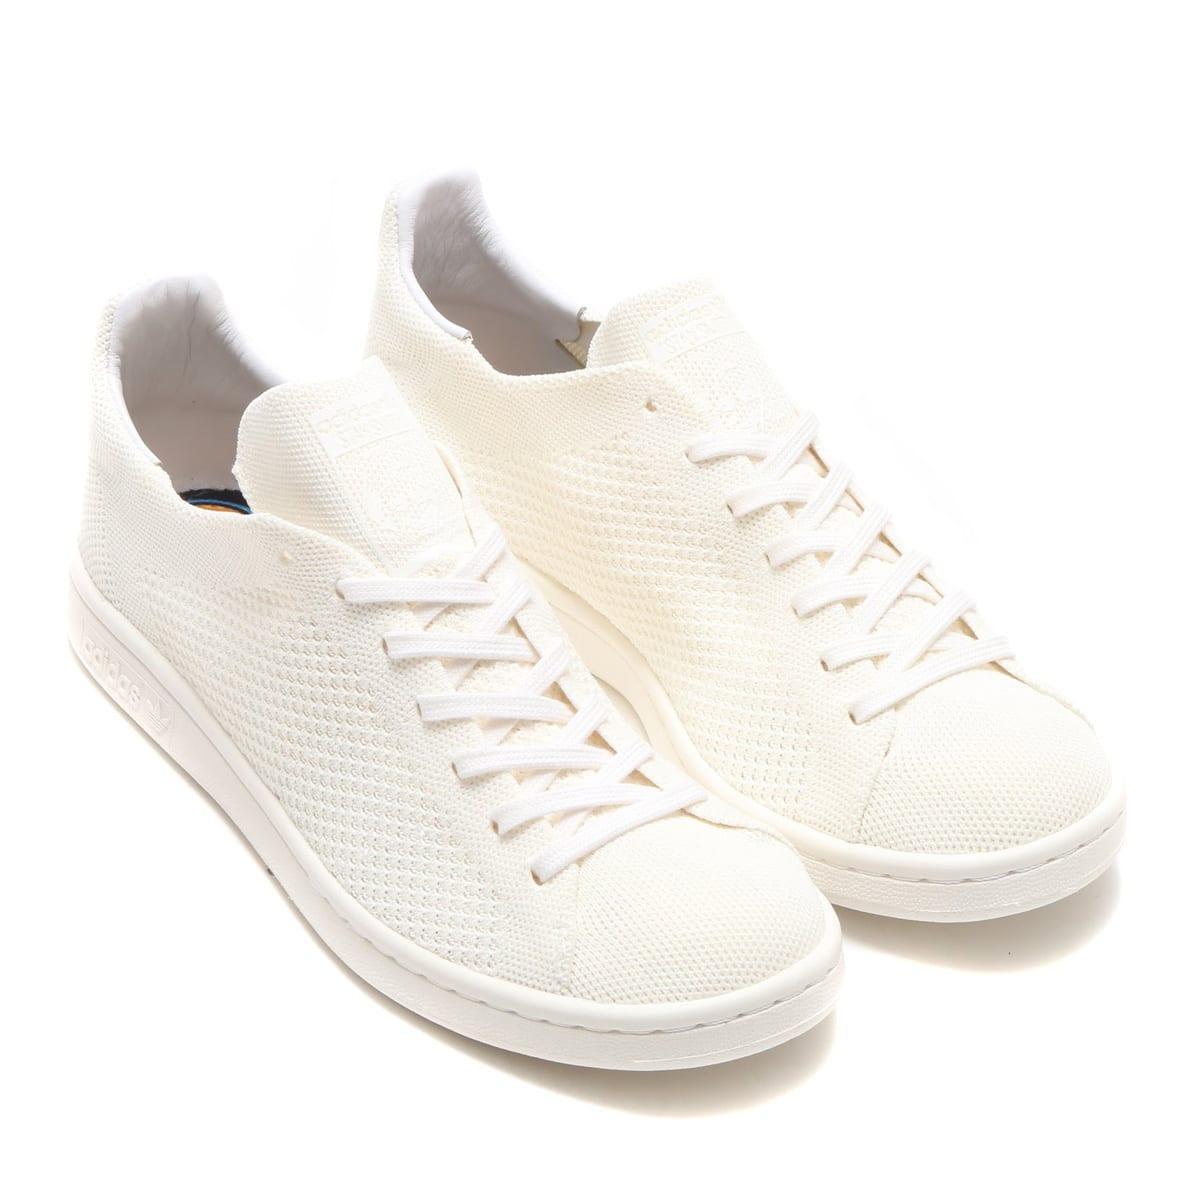 adidas Originals PW HU HOLI STAN SMITH BC  Cream White/Ftwr White/Ftwr White_photo_large